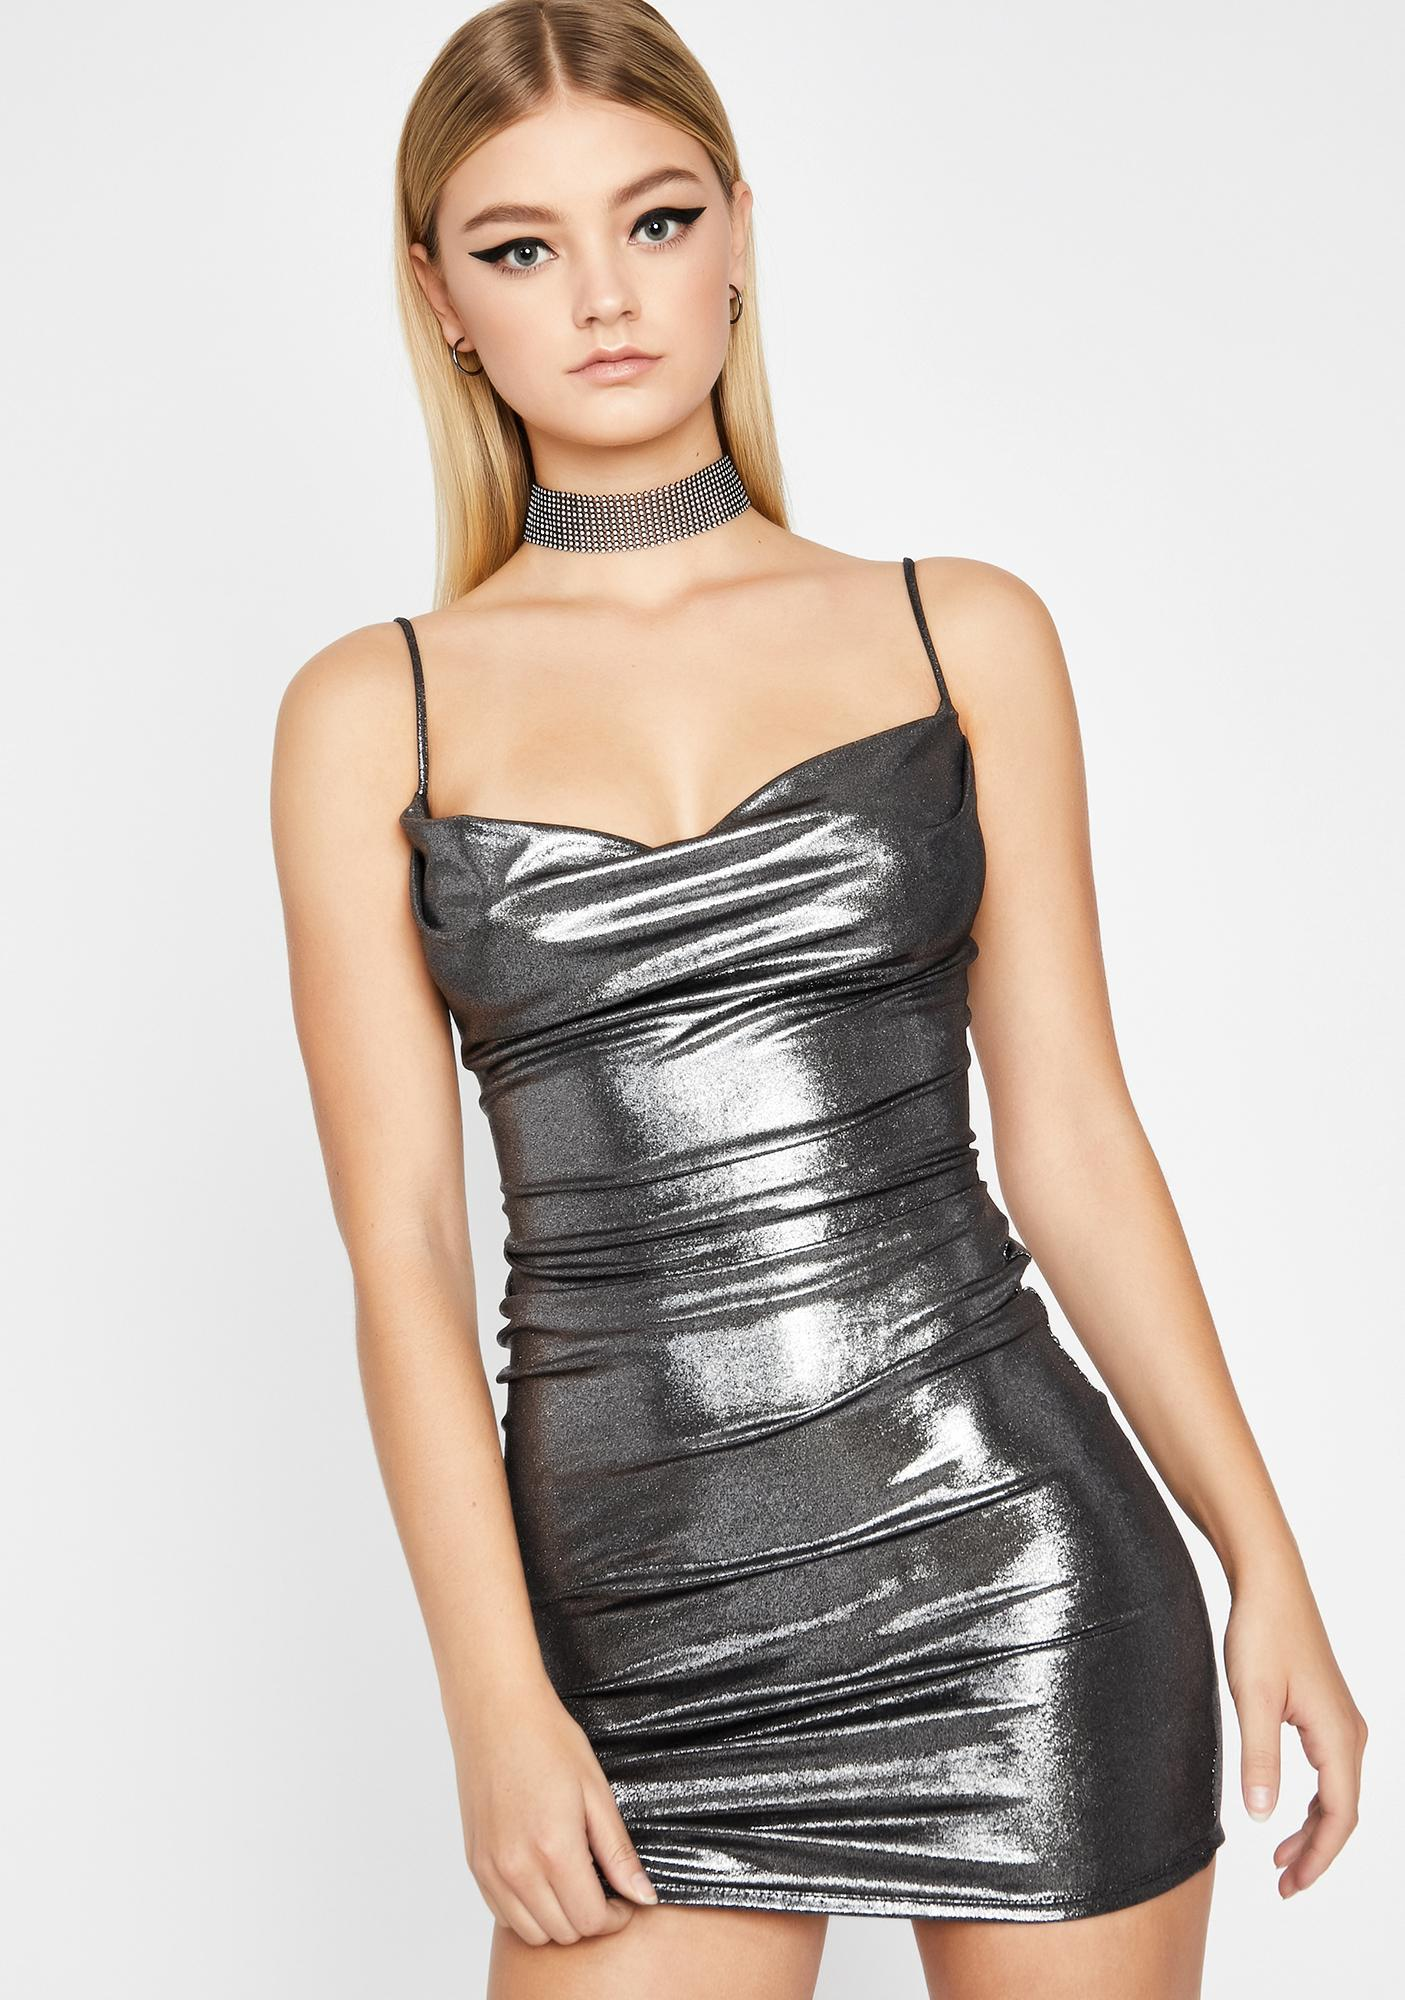 dress clubwear evening germany minidress lace back  black  small-x-large